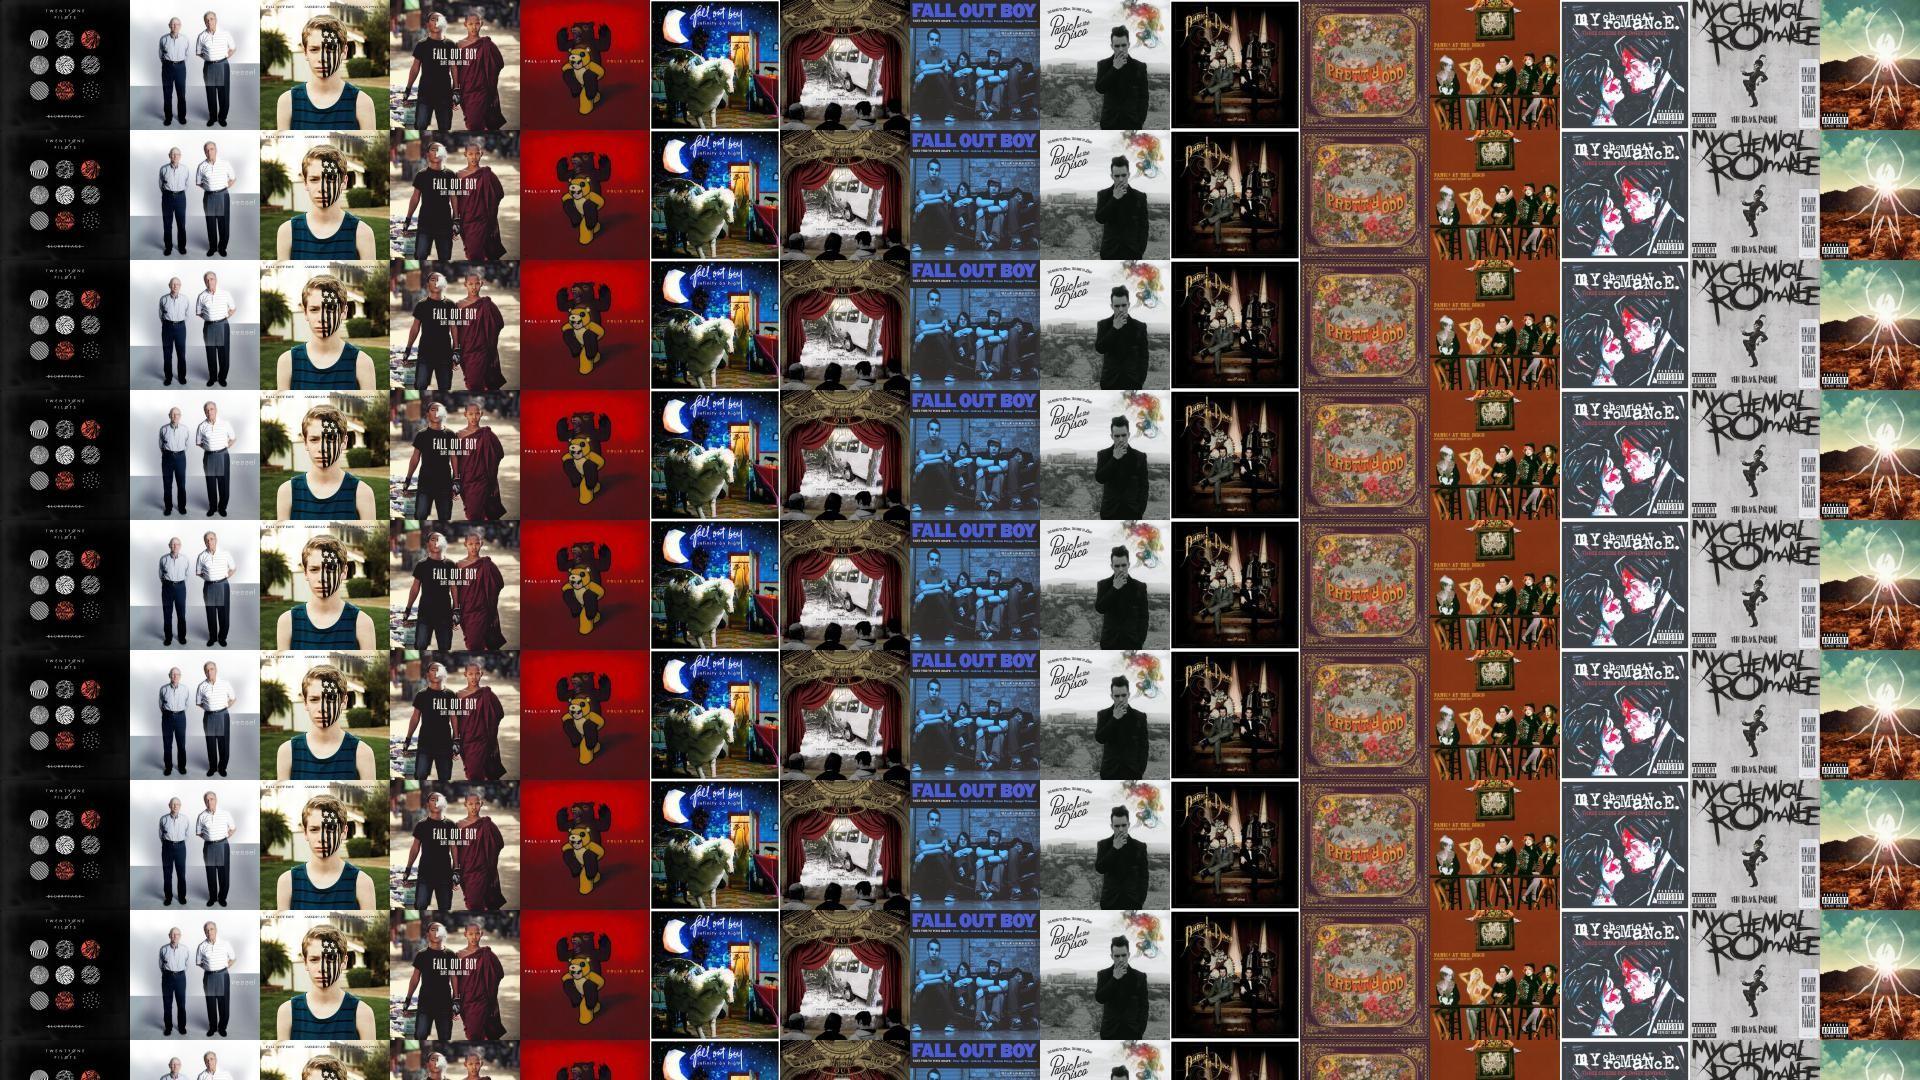 Twenty One Pilots Blurryface Vessel Fall Out Boy Wallpaper Â« Tiled Desktop  Wallpaper